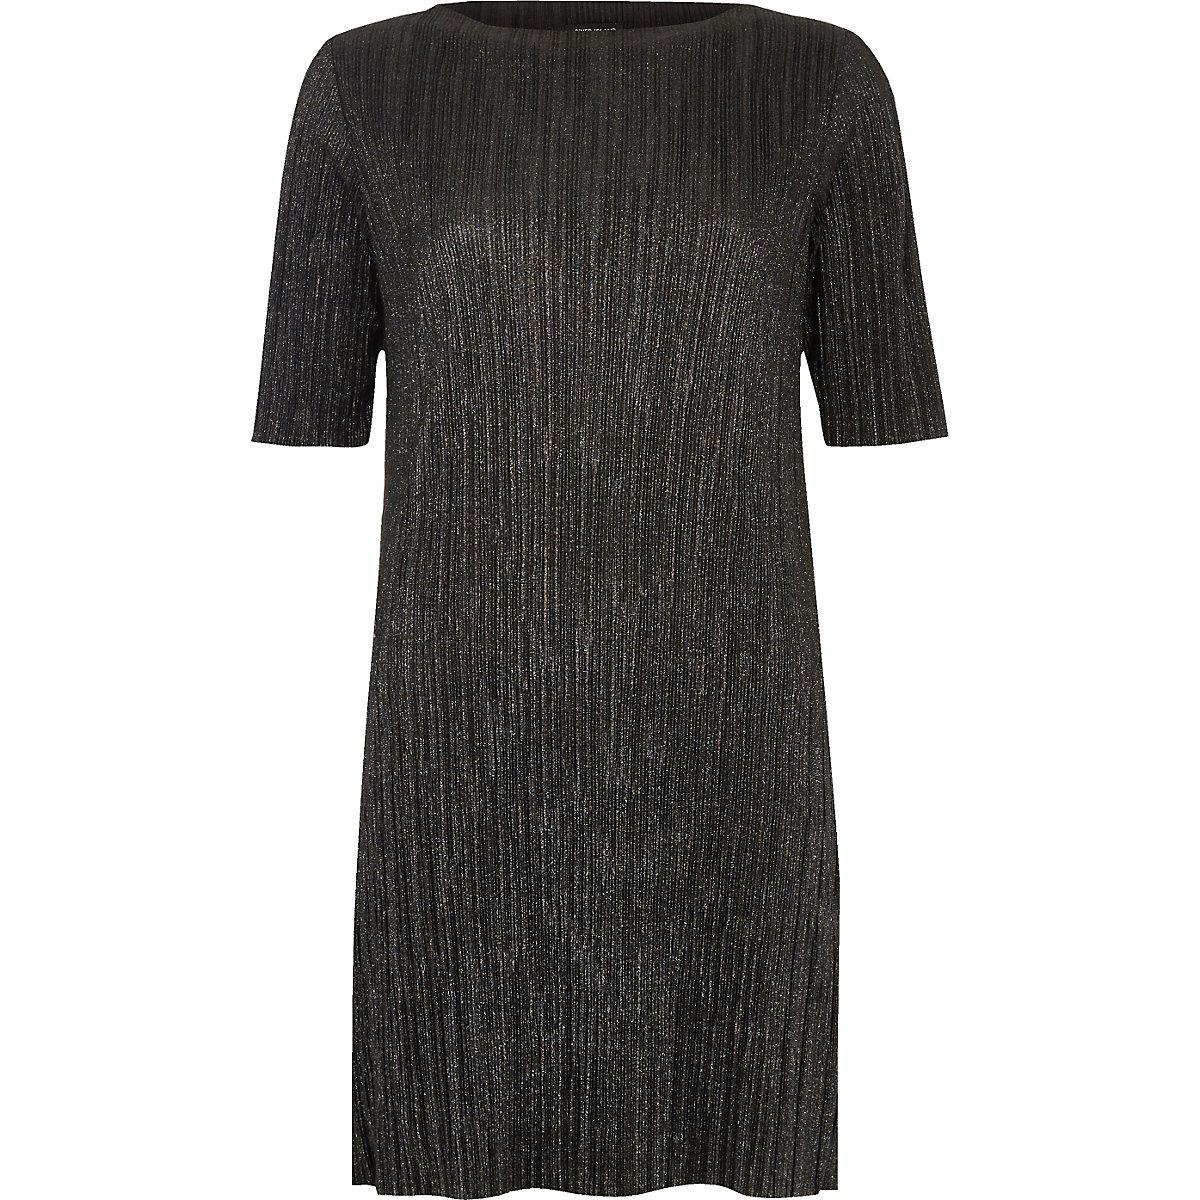 Black Pleated Metallic Dress T Shirt Dresses Dresses Women